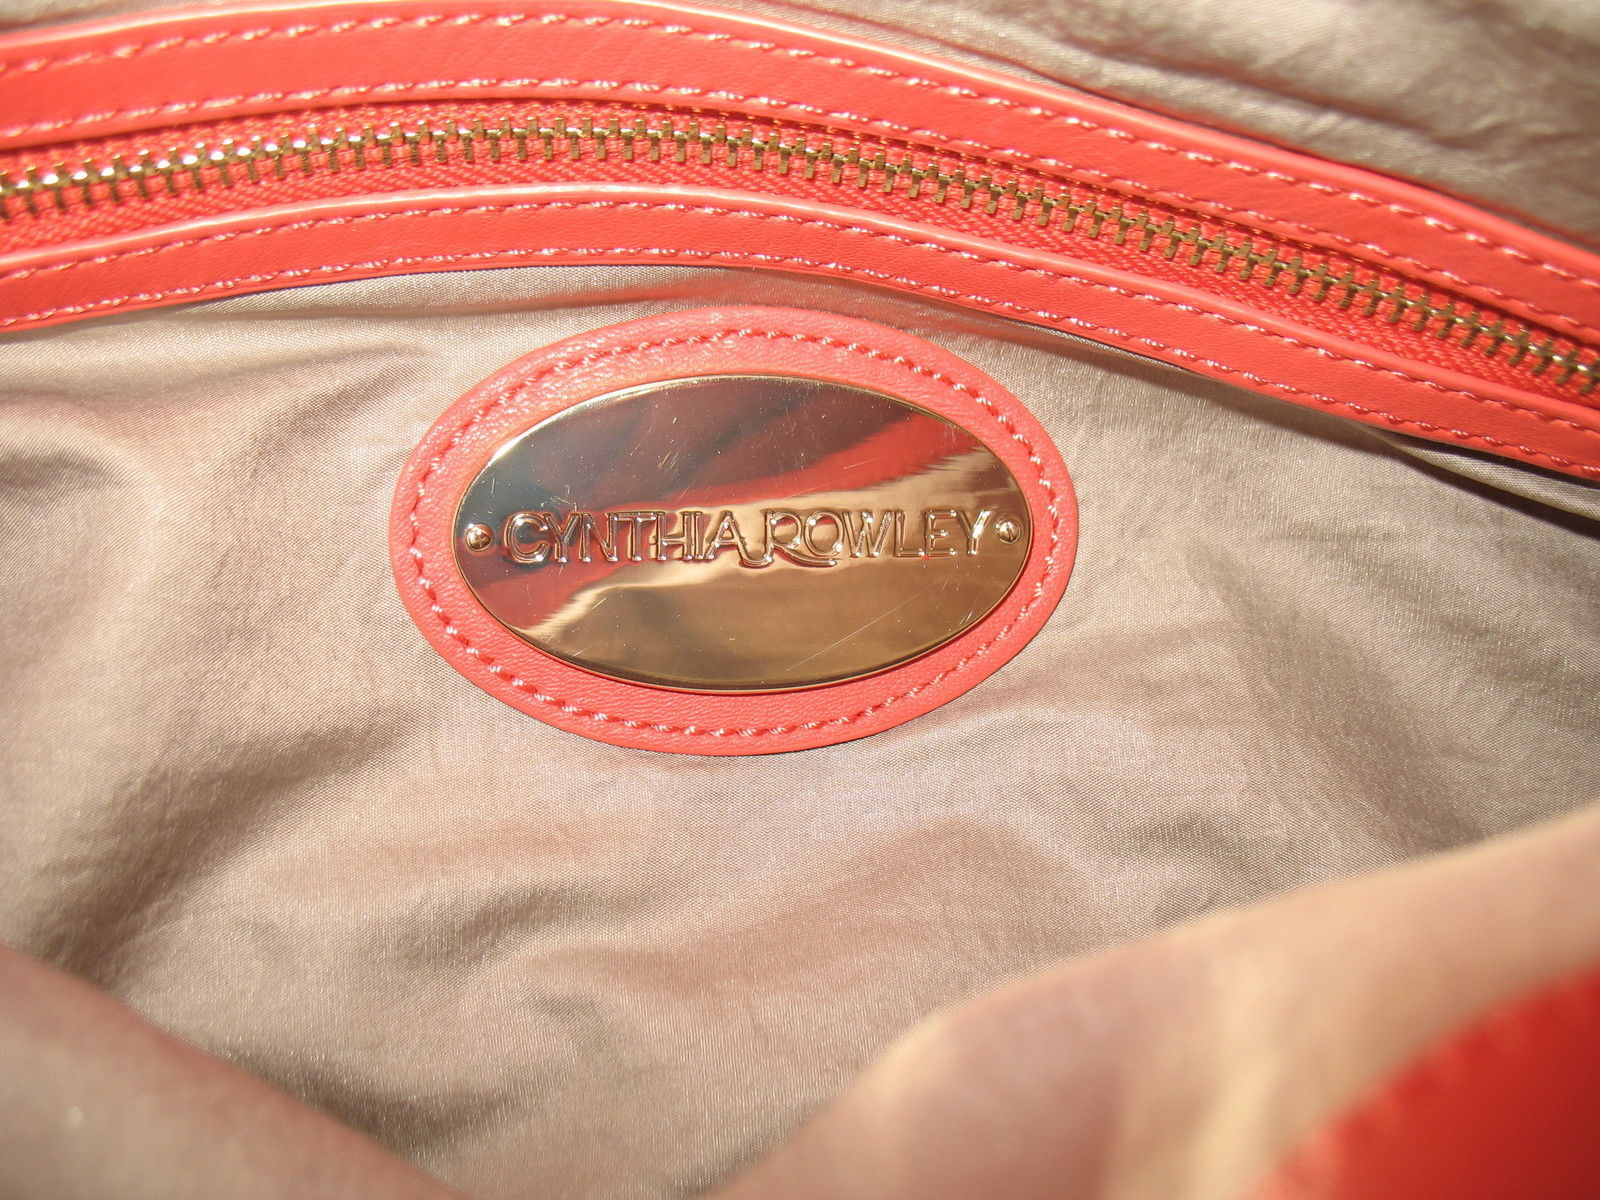 Cynthia Rowley New Purse Handbag Leather Crossbody Calloway Orange Coral White image 5